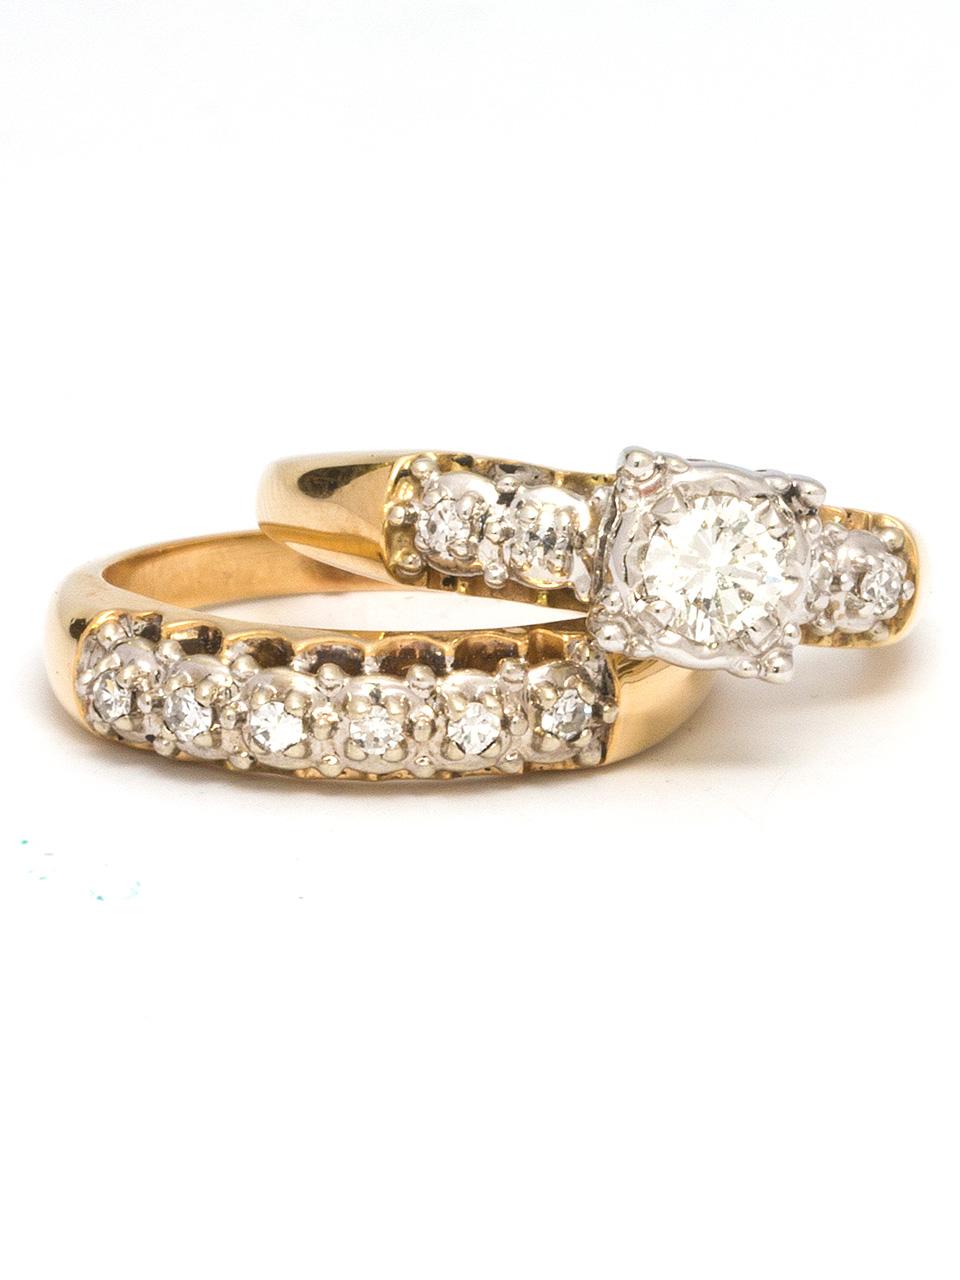 14K YG Diamond Wedding Set 0.25 H VS-2 1950's